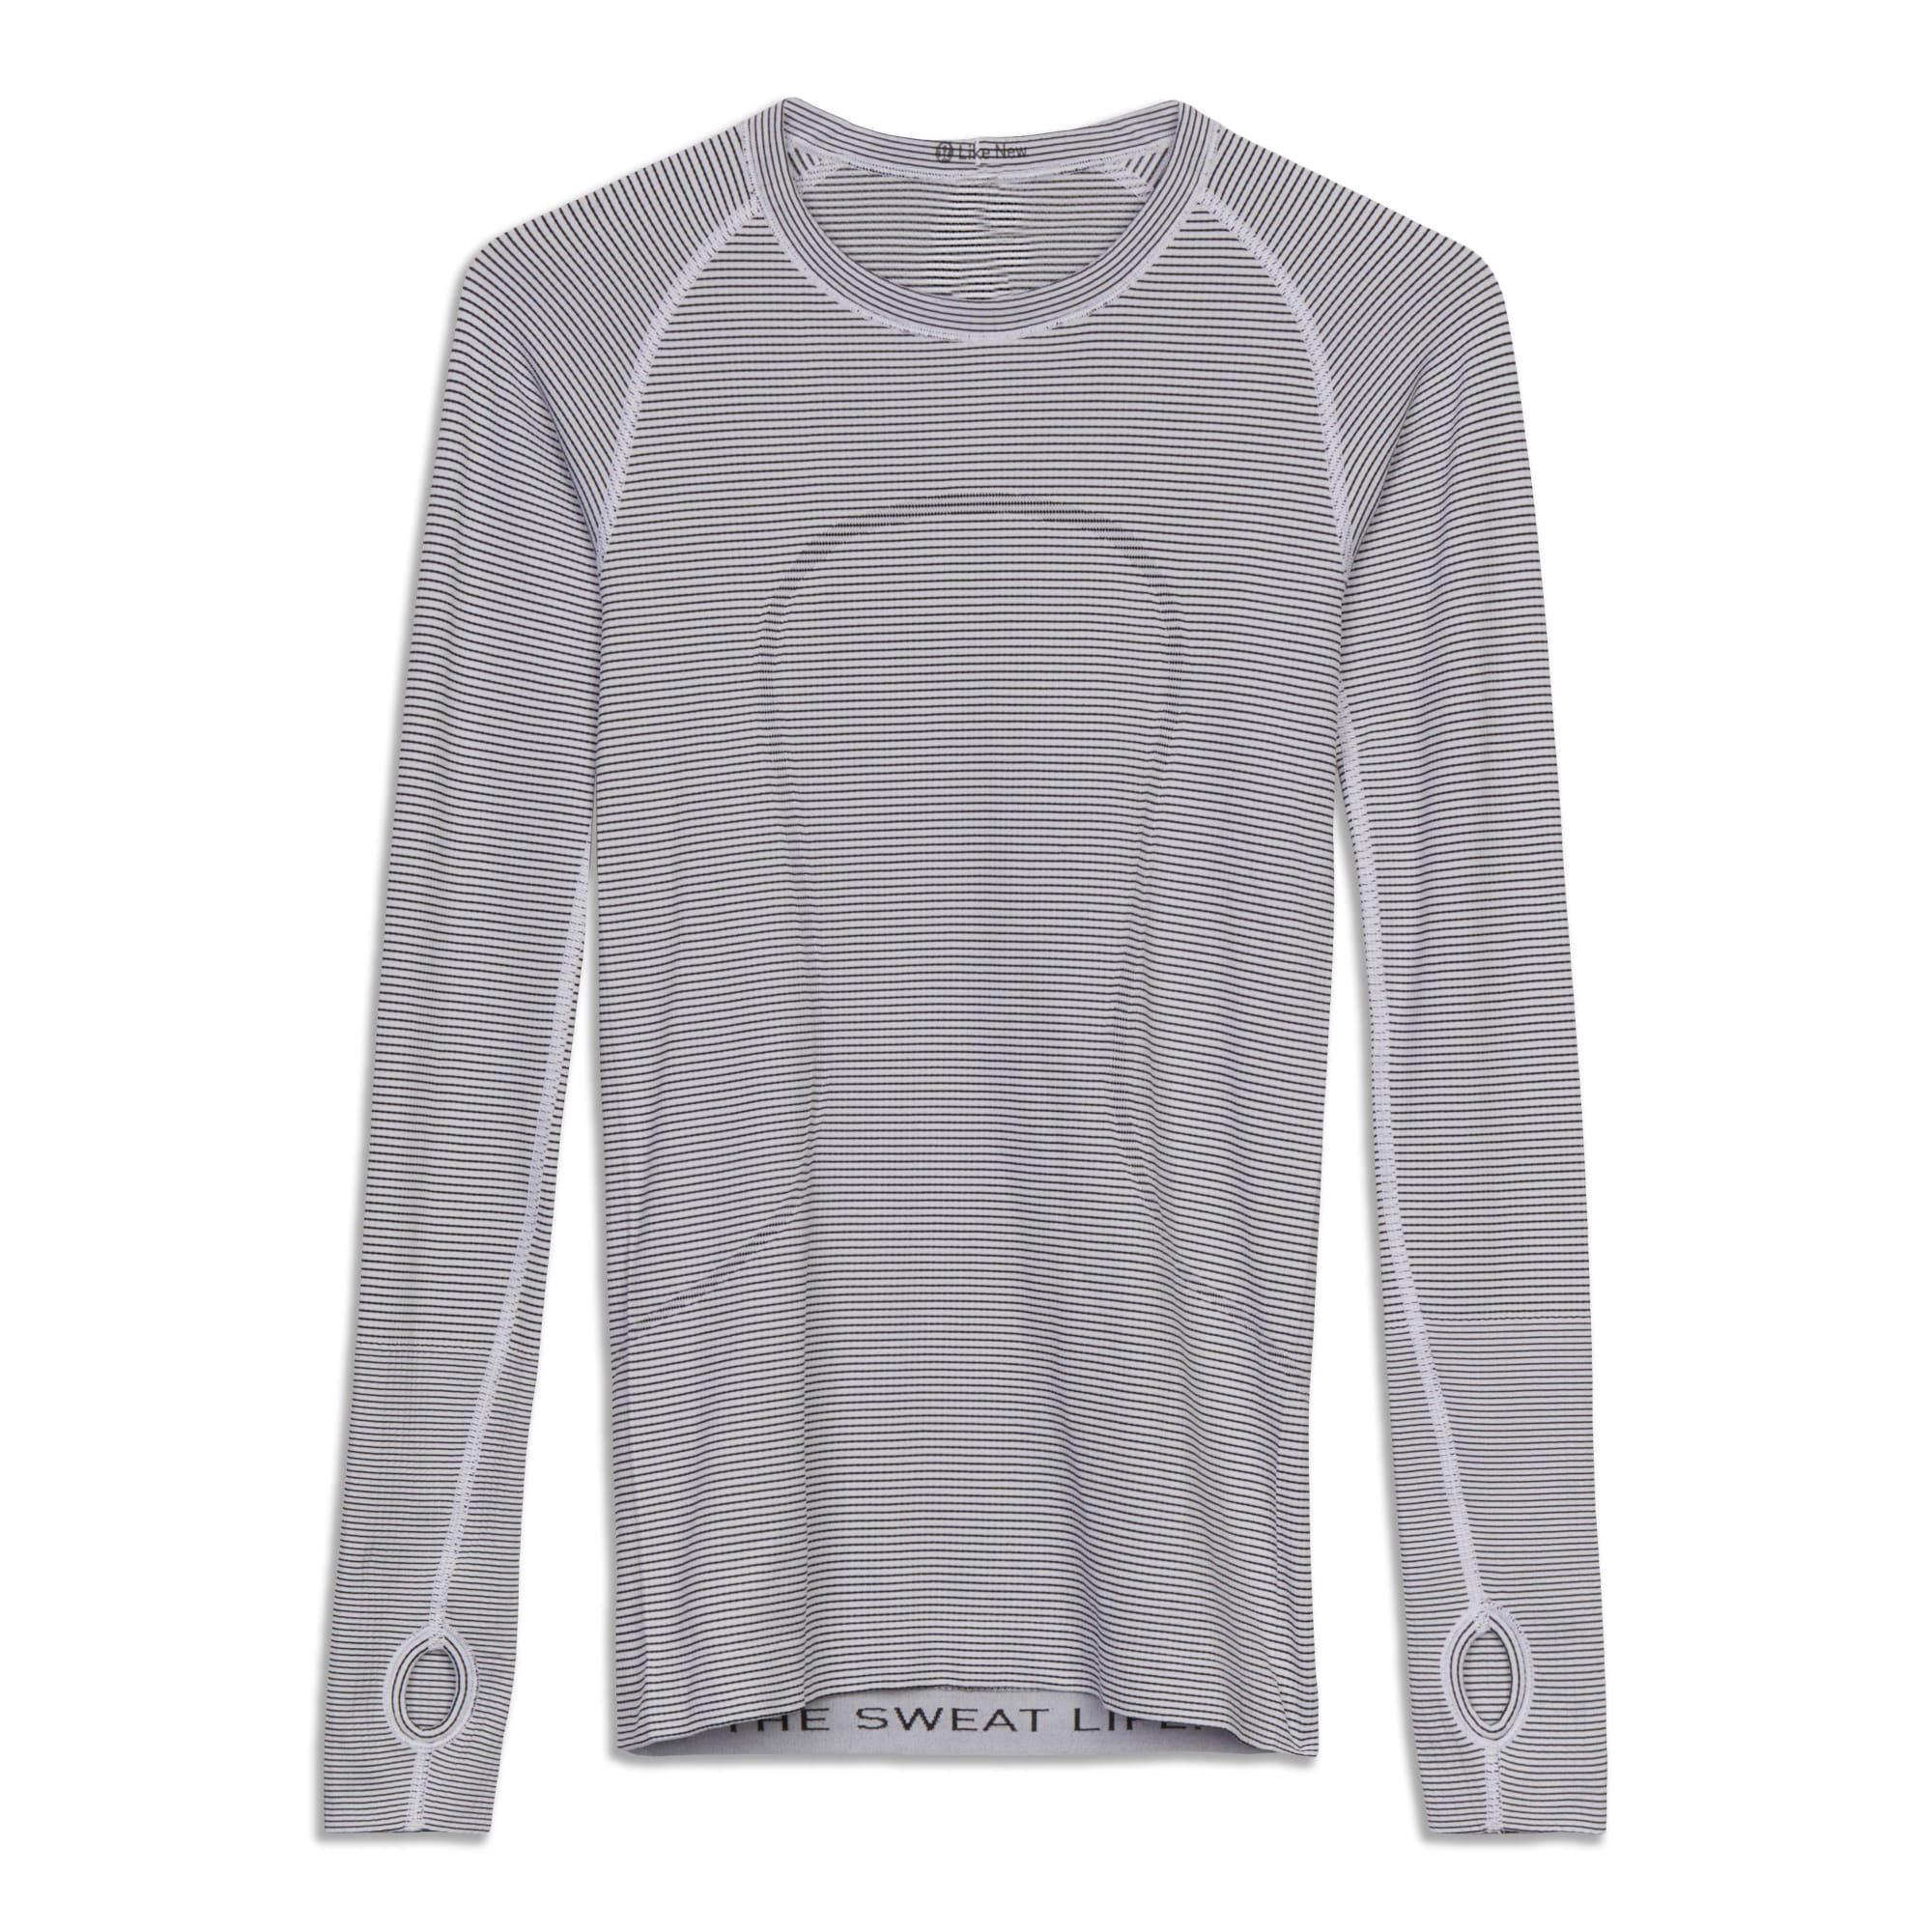 Main product image: Run Swiftly Tech Long Sleeve Shirt - Resale